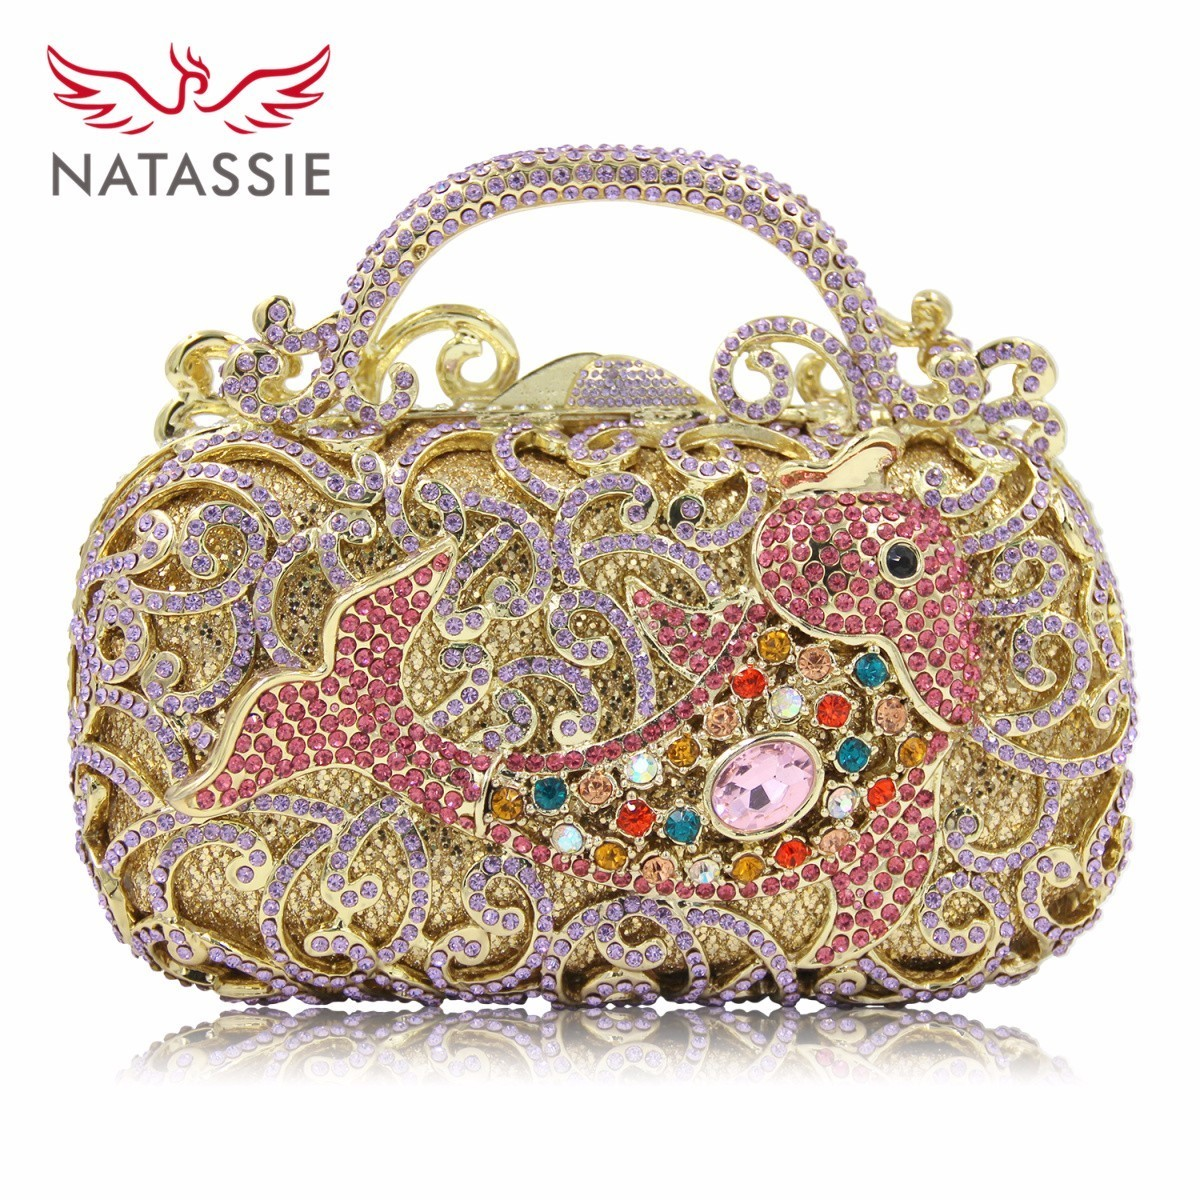 NATASSIE New Design Princess Crystal Purse Long Chain  Ladies Date Clutch Women Evening Bag Birthday Gift Good Quality